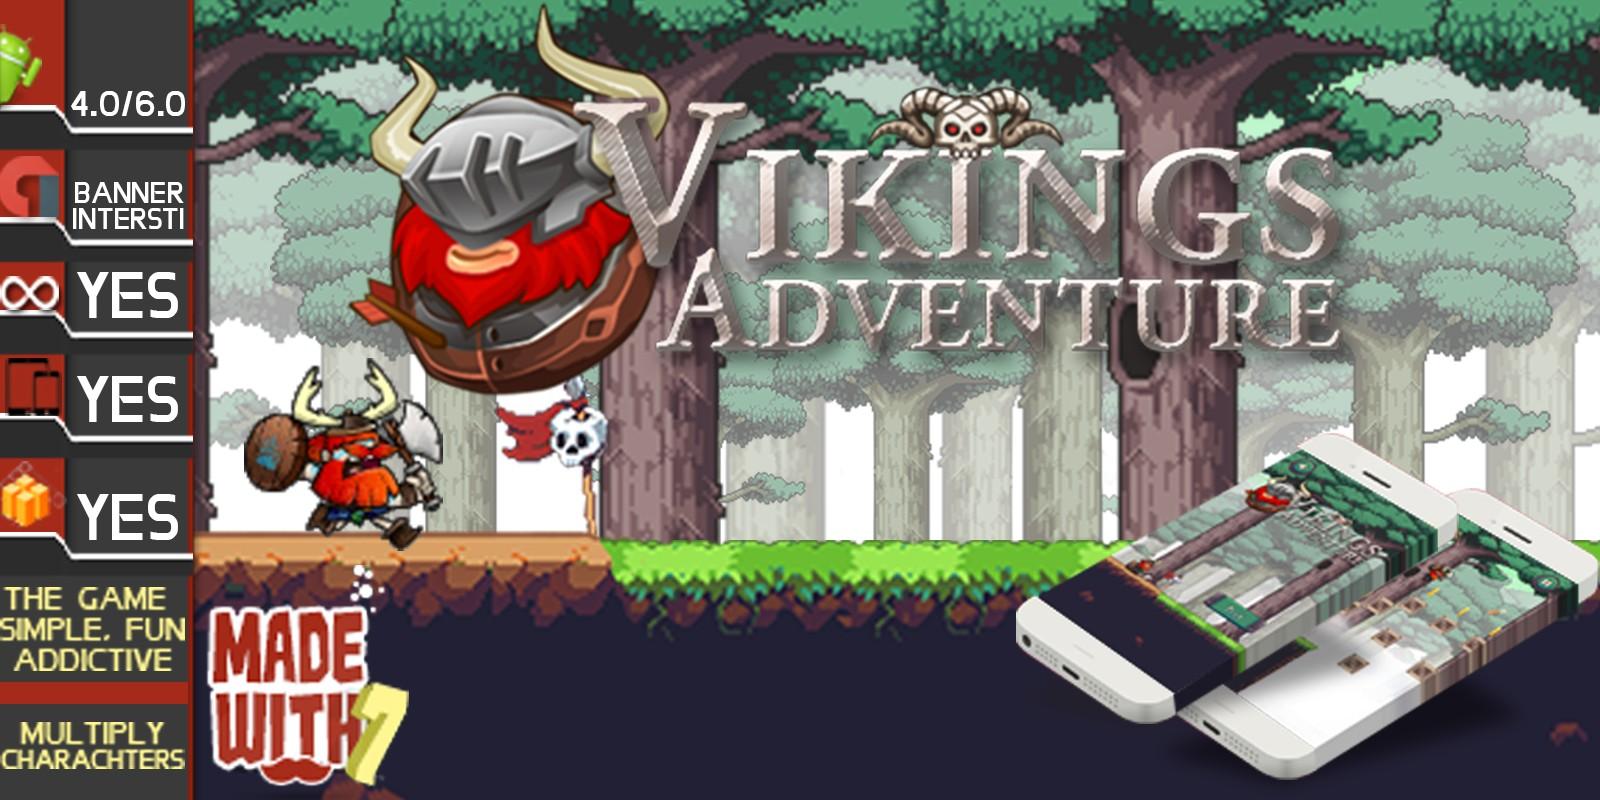 Viking Adventure - Buildbox Game Template